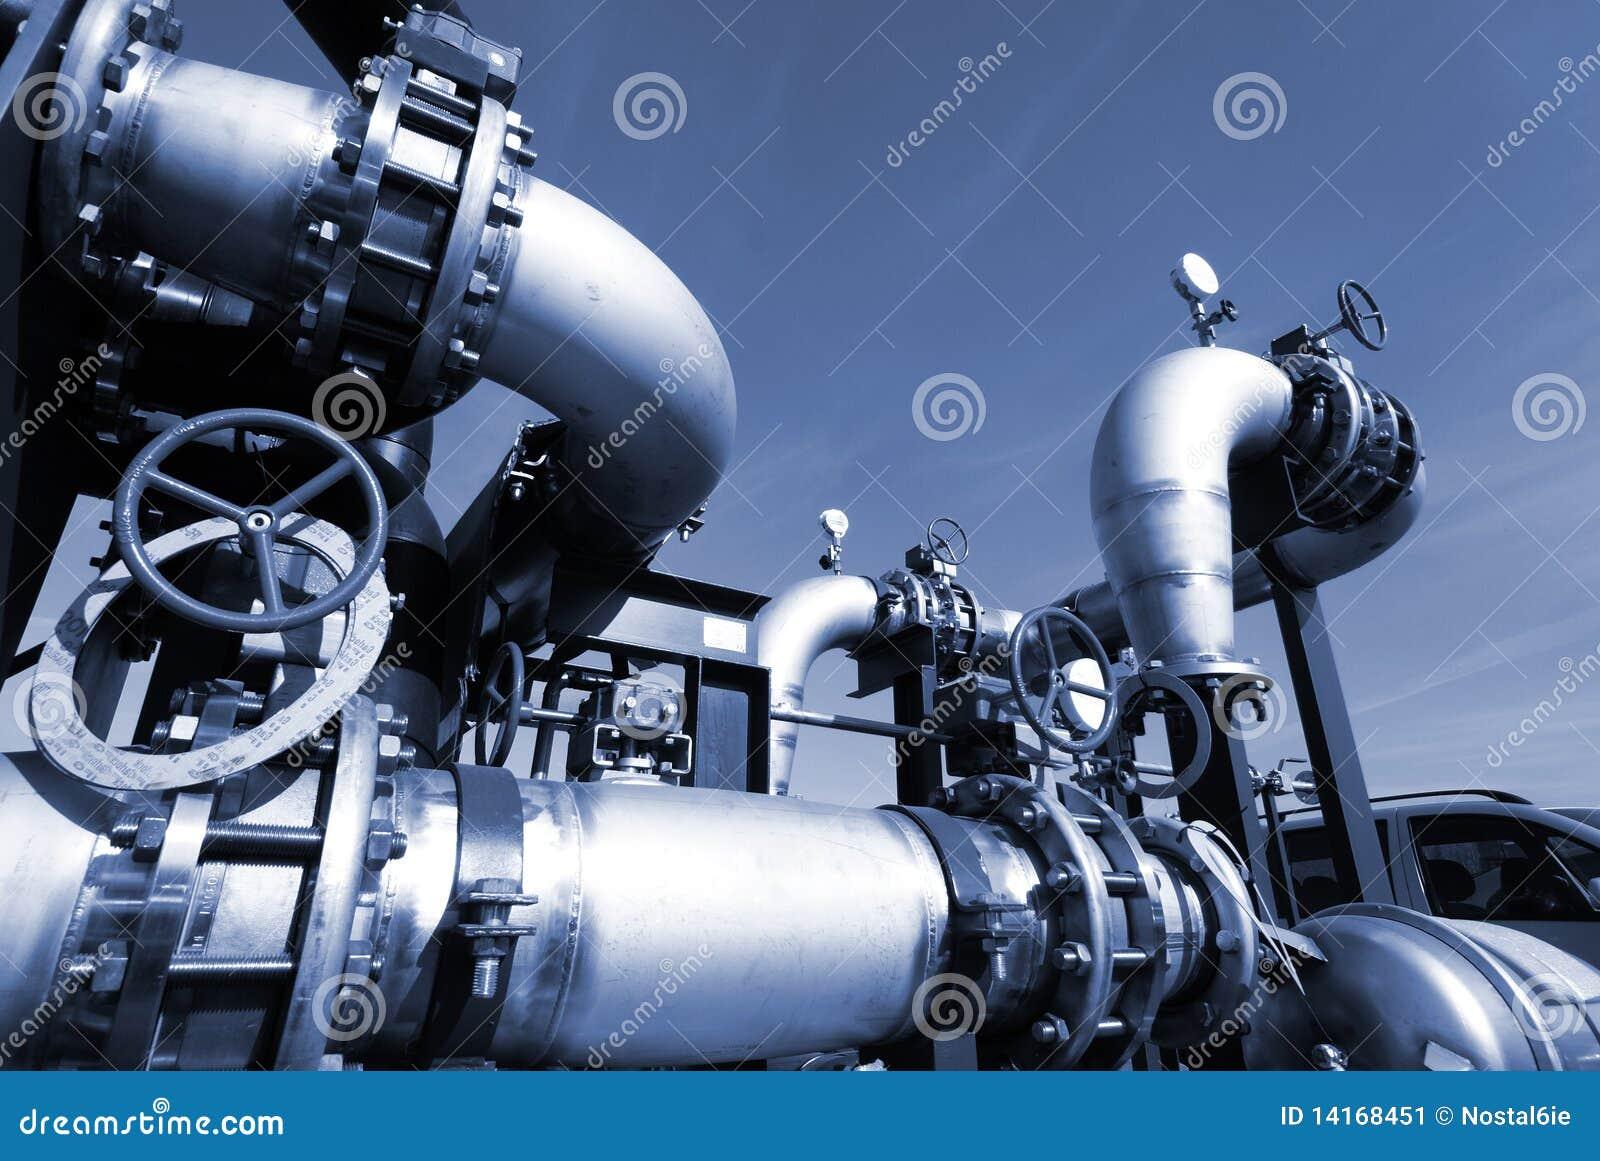 Industry Steel pipelines at factory